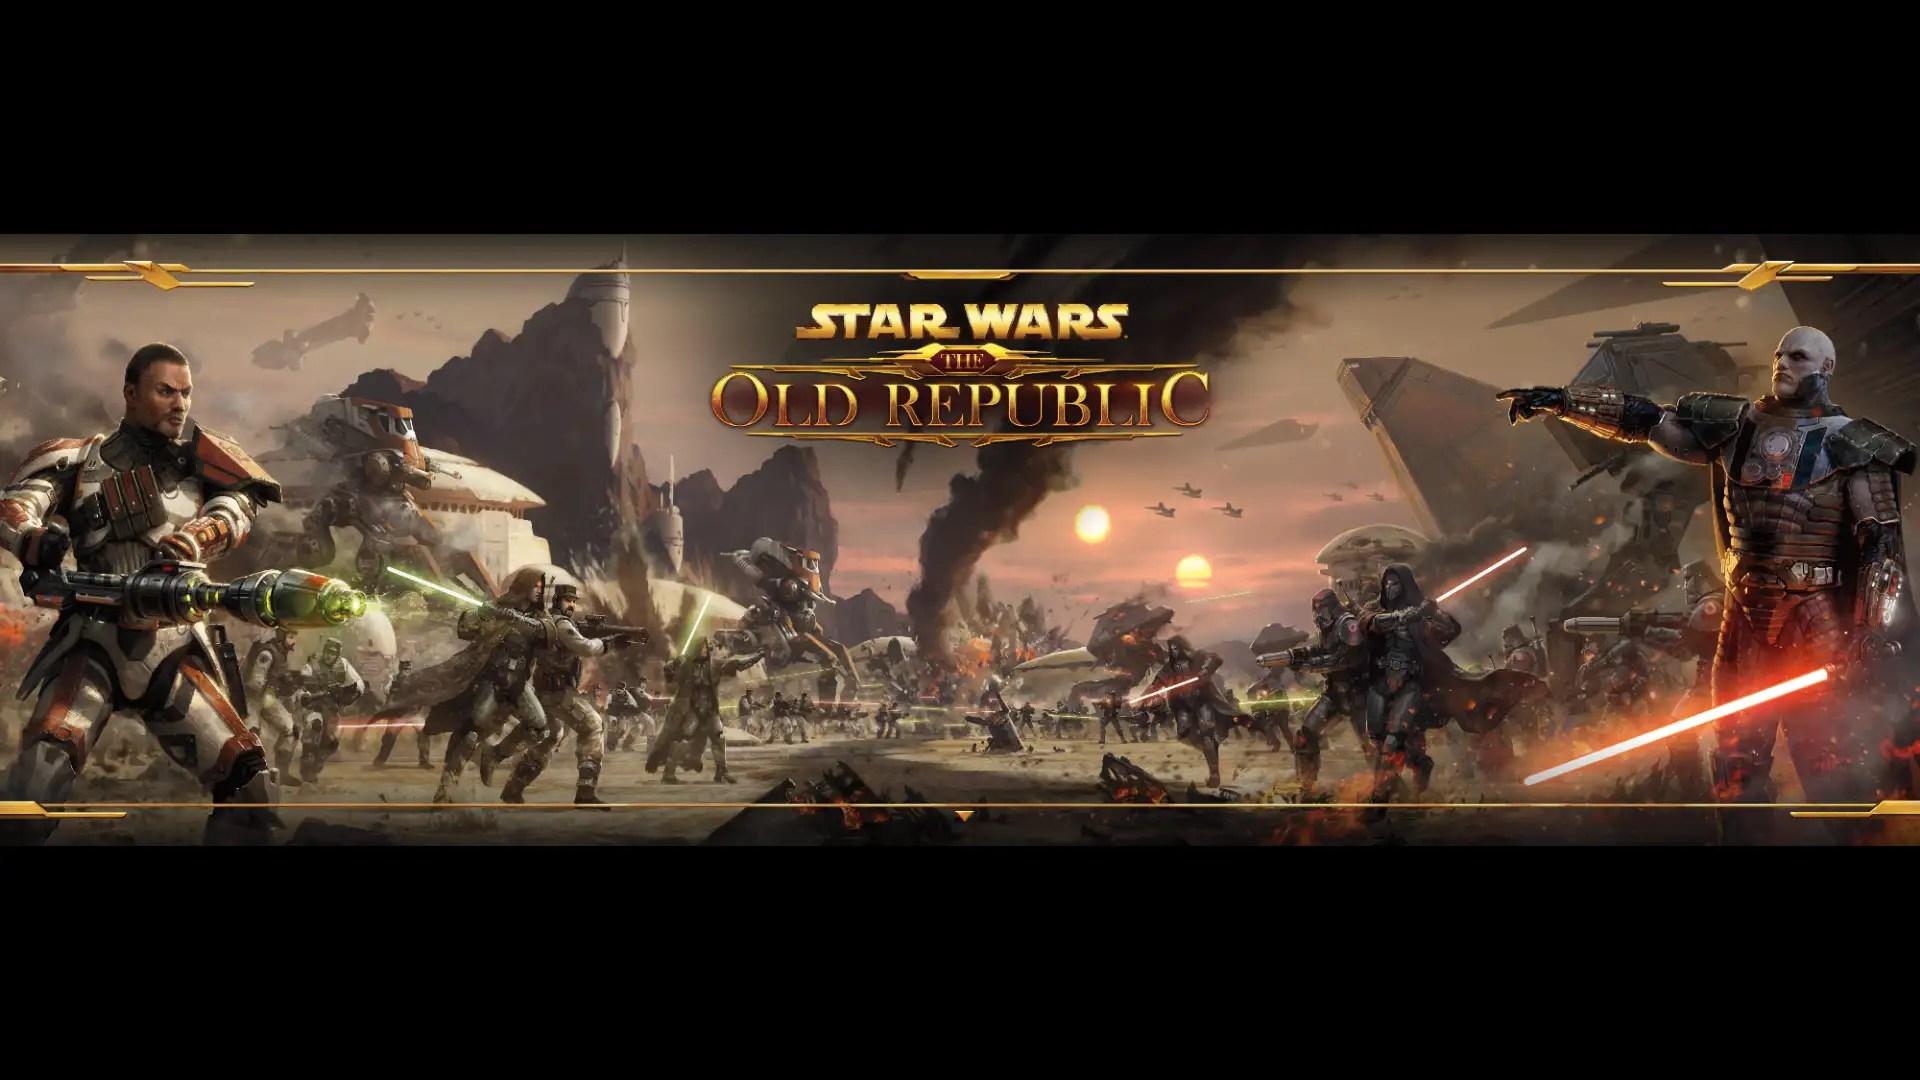 Star Wars The Old Republic Wallpaper Dark And Light Side Battle